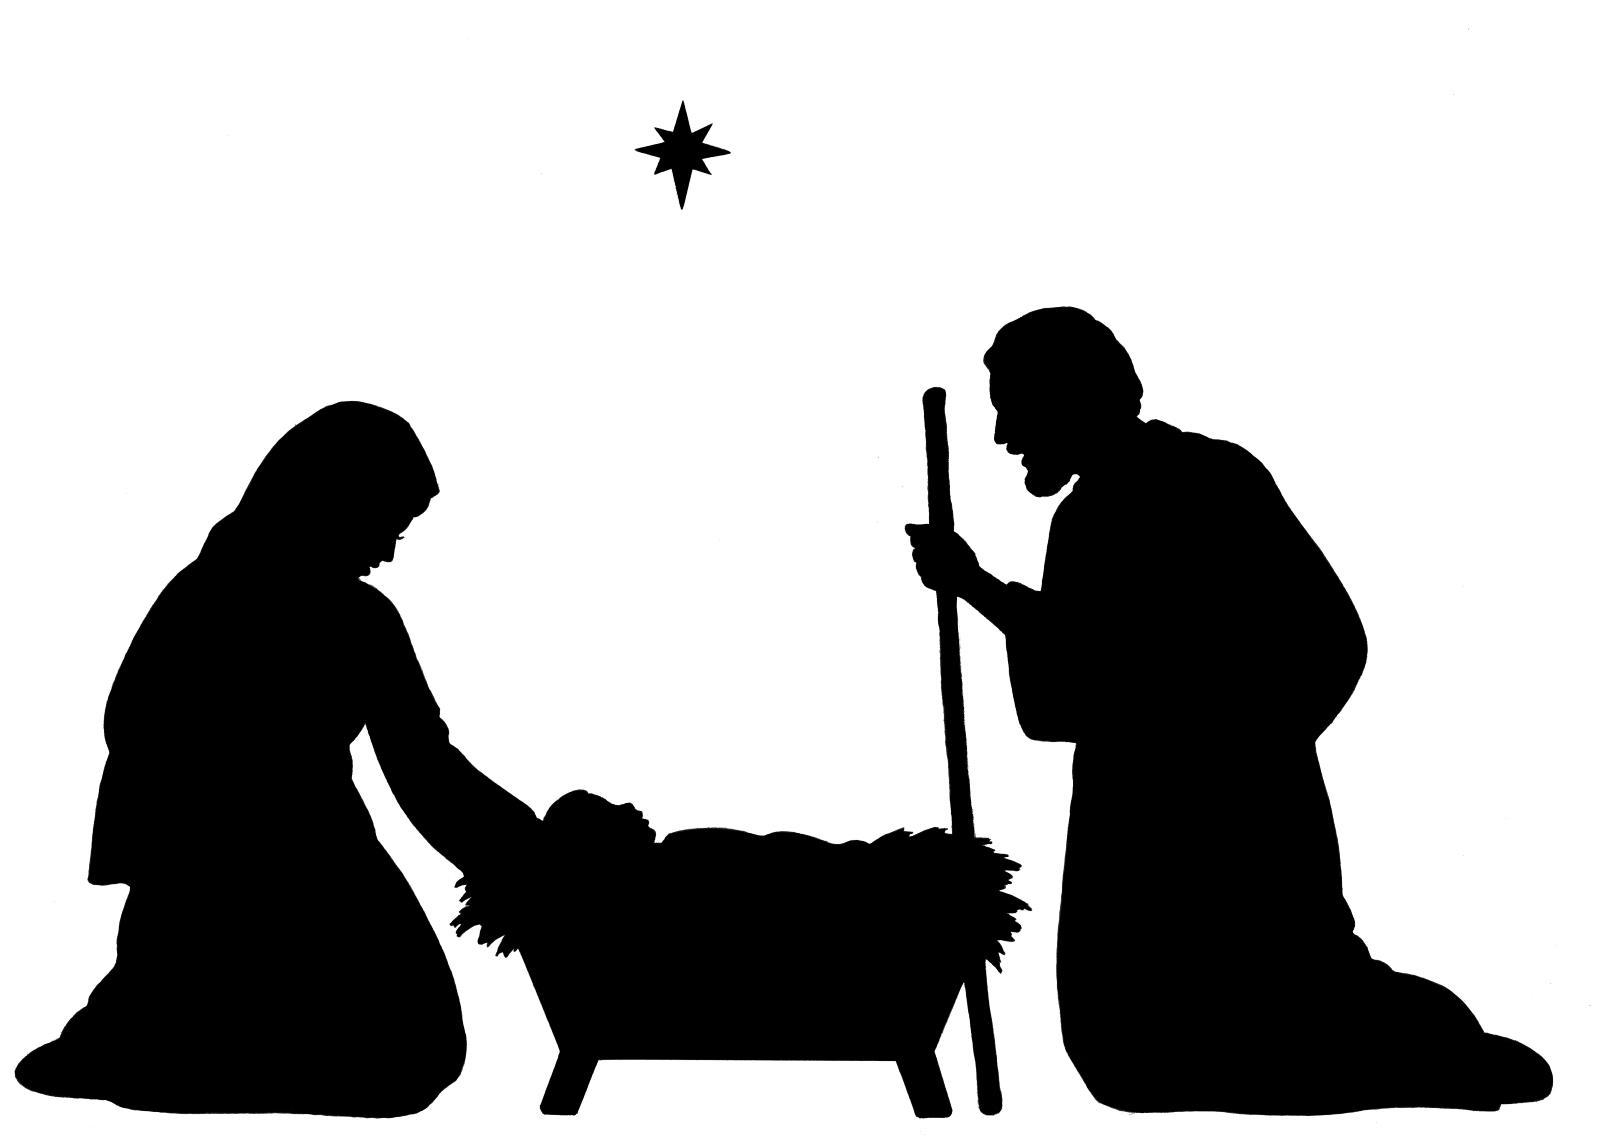 Free Printable Nativity Silhouette Pattern - Free Printable Nativity Silhouette